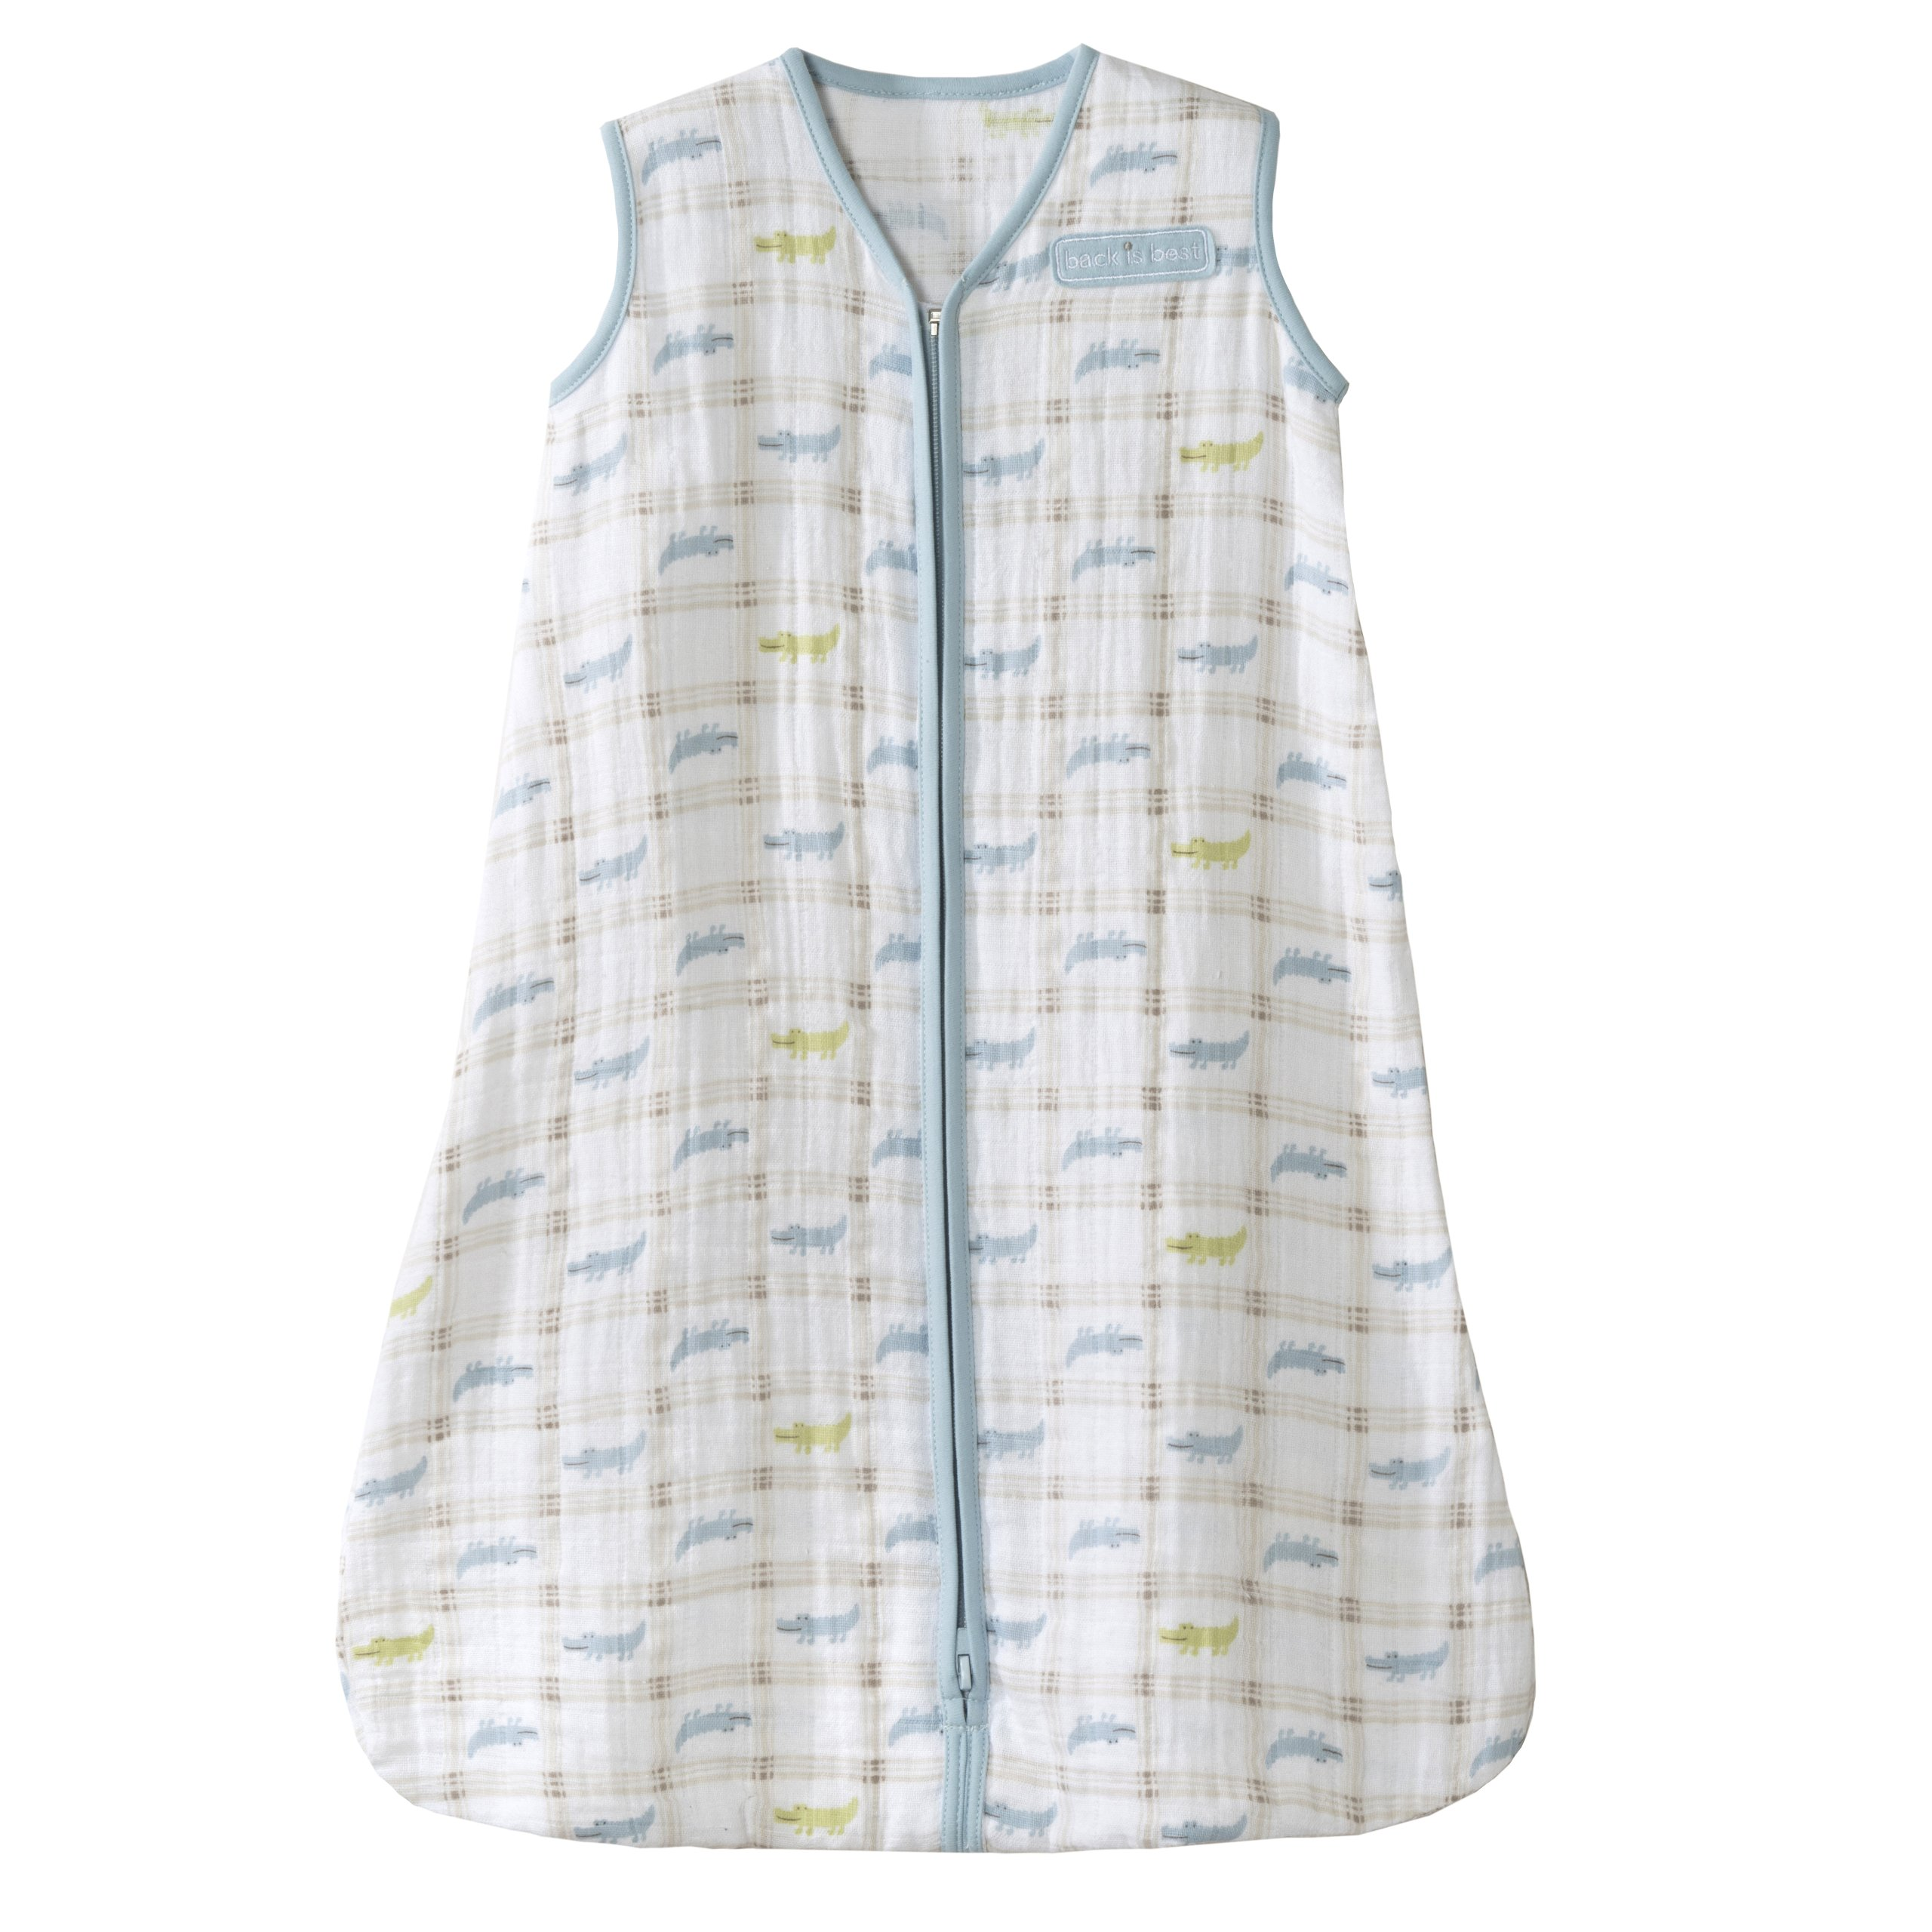 HALO 100% Cotton Muslin Sleepsack Wearable Blanket, Gator Plaid, Medium